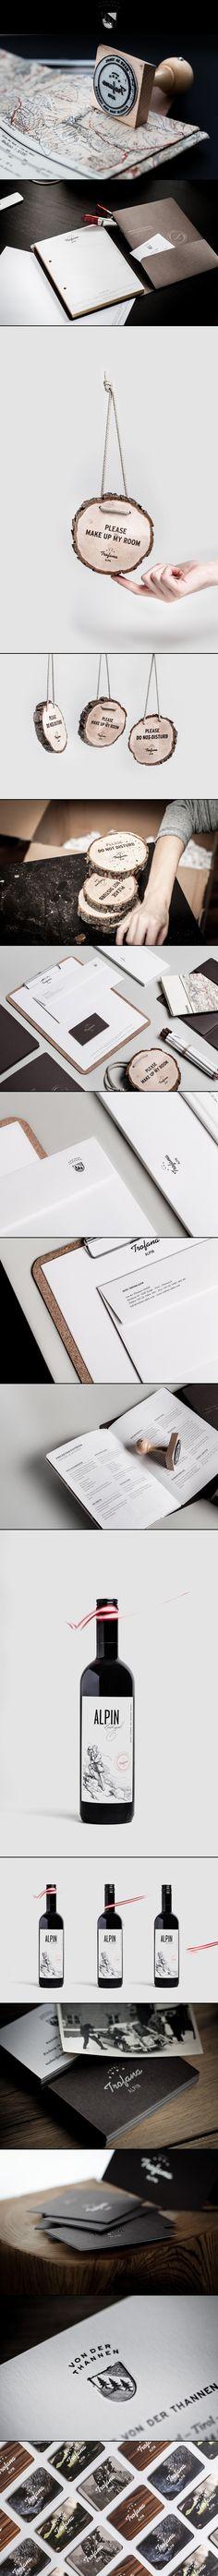 Trofana hotel - via behance #identity #packaging #branding PD